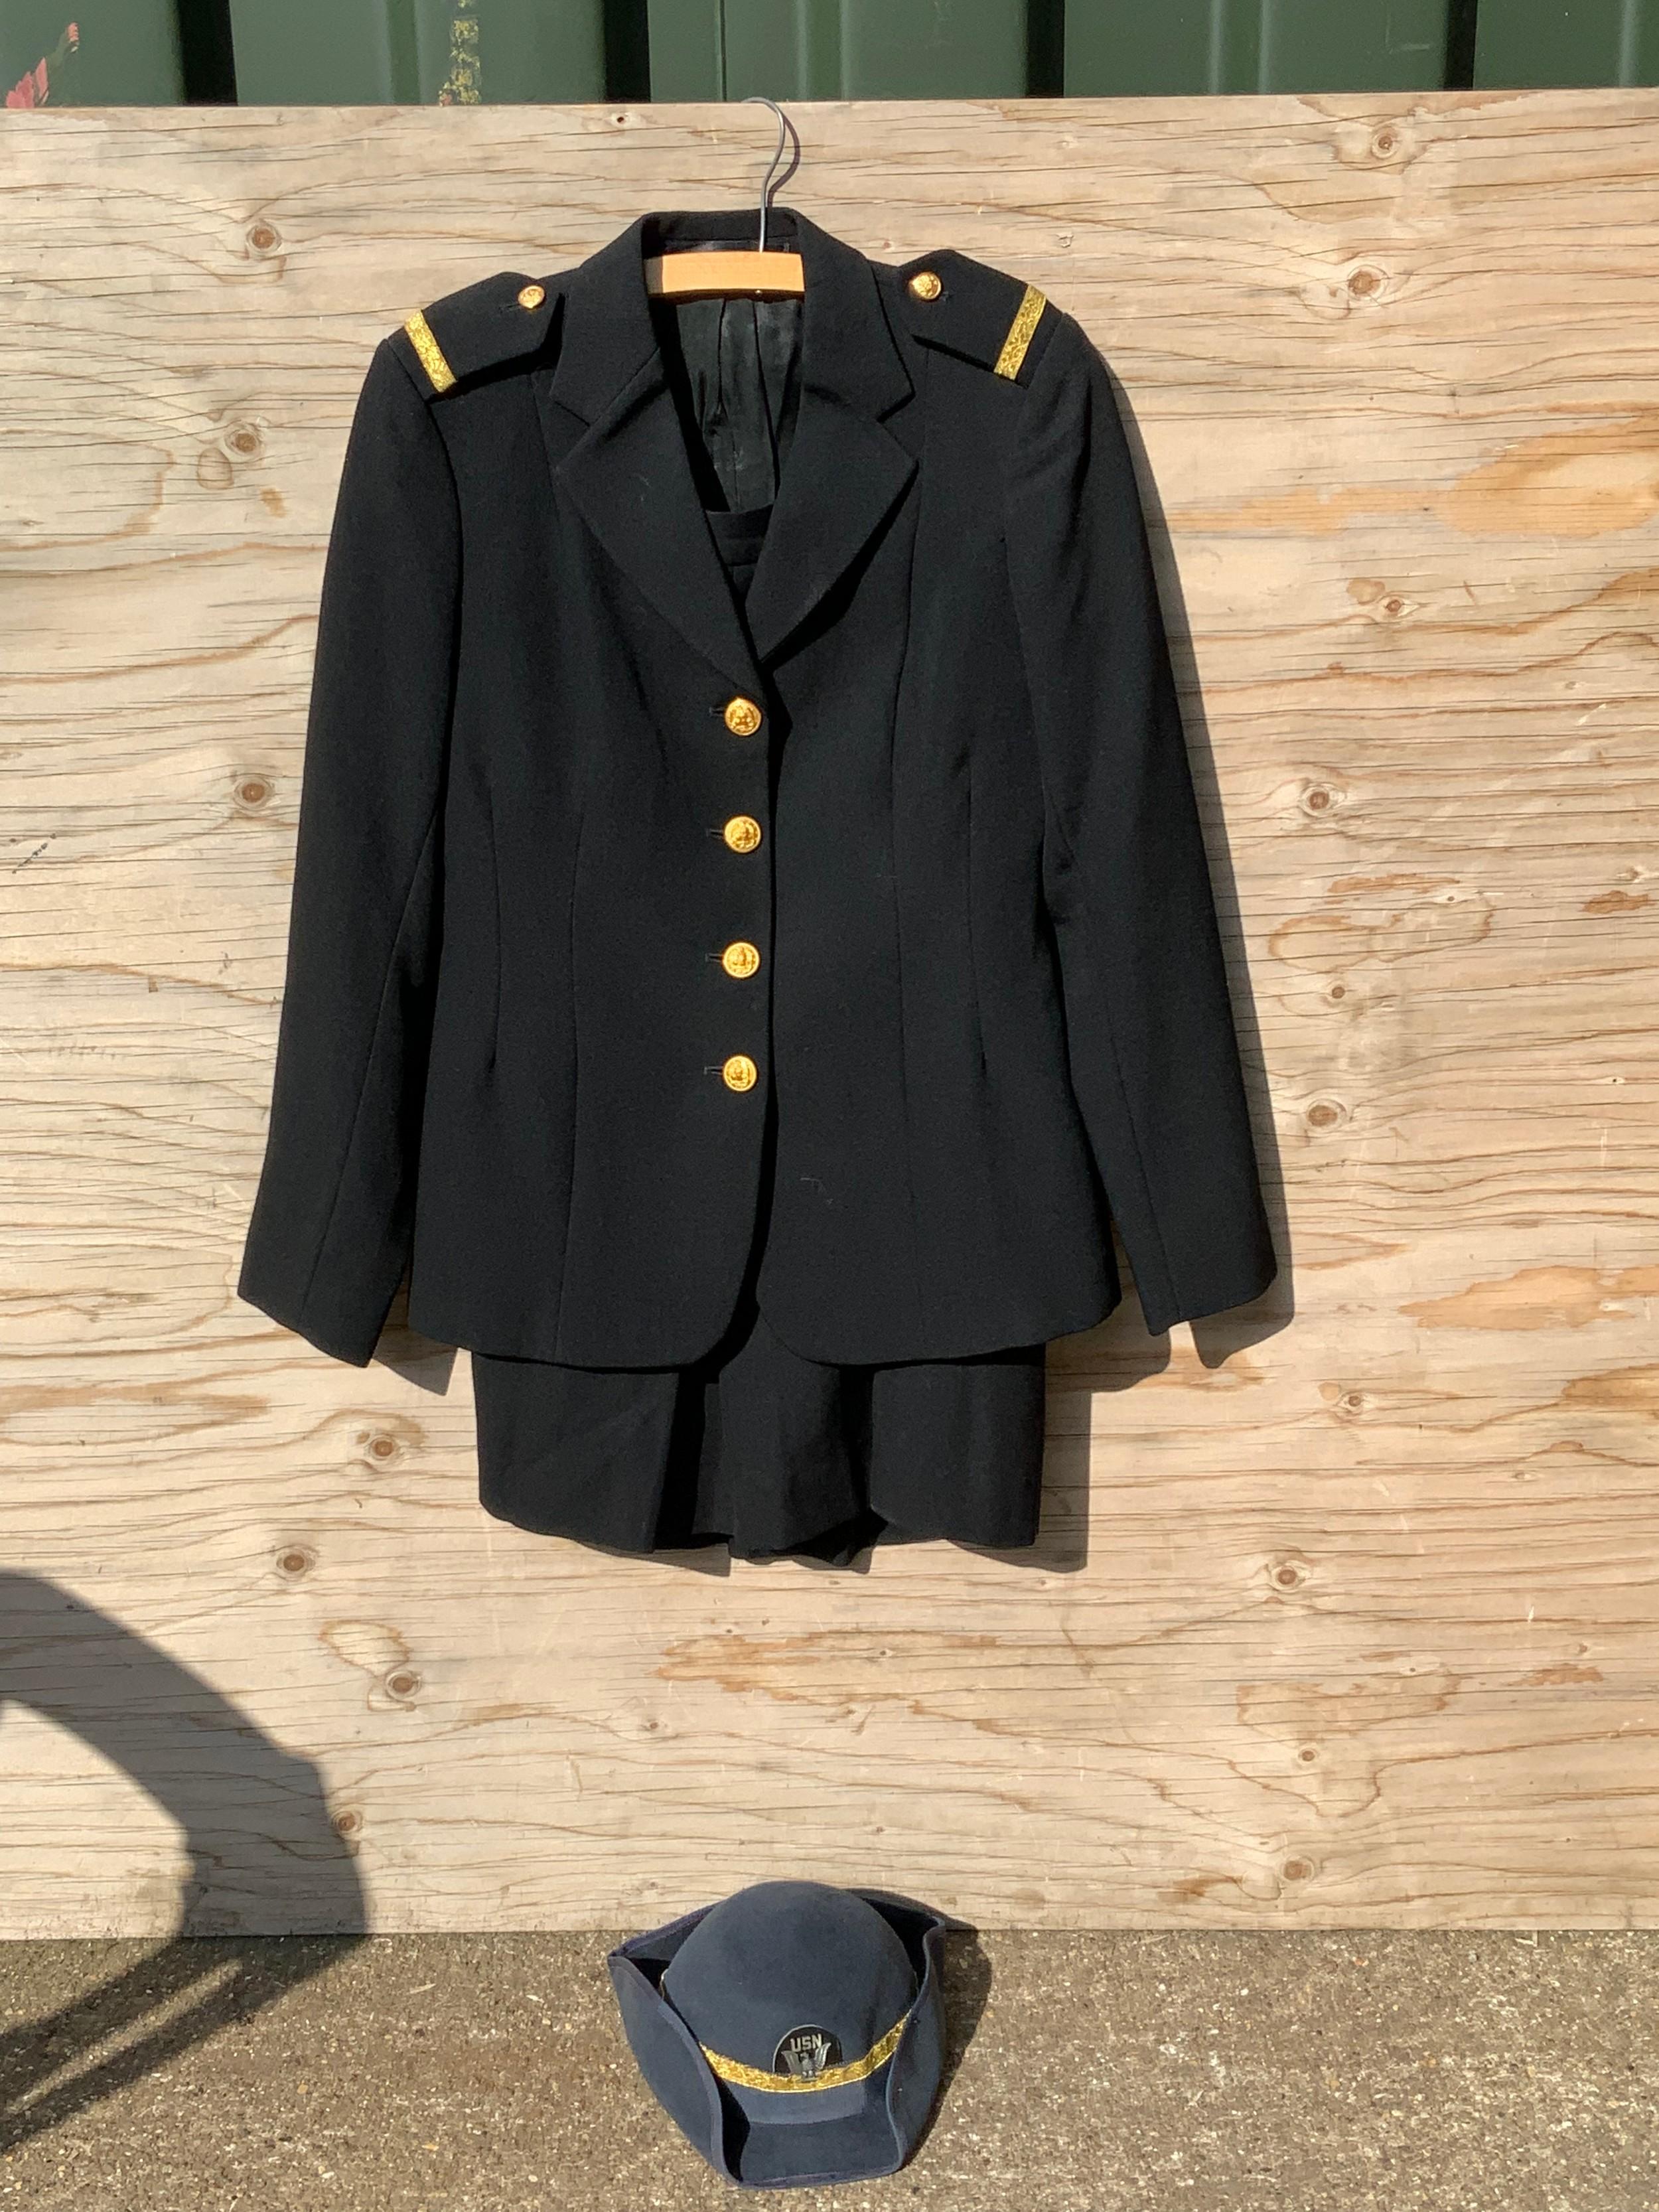 United States Navy Female Officers Uniform - Image 2 of 3